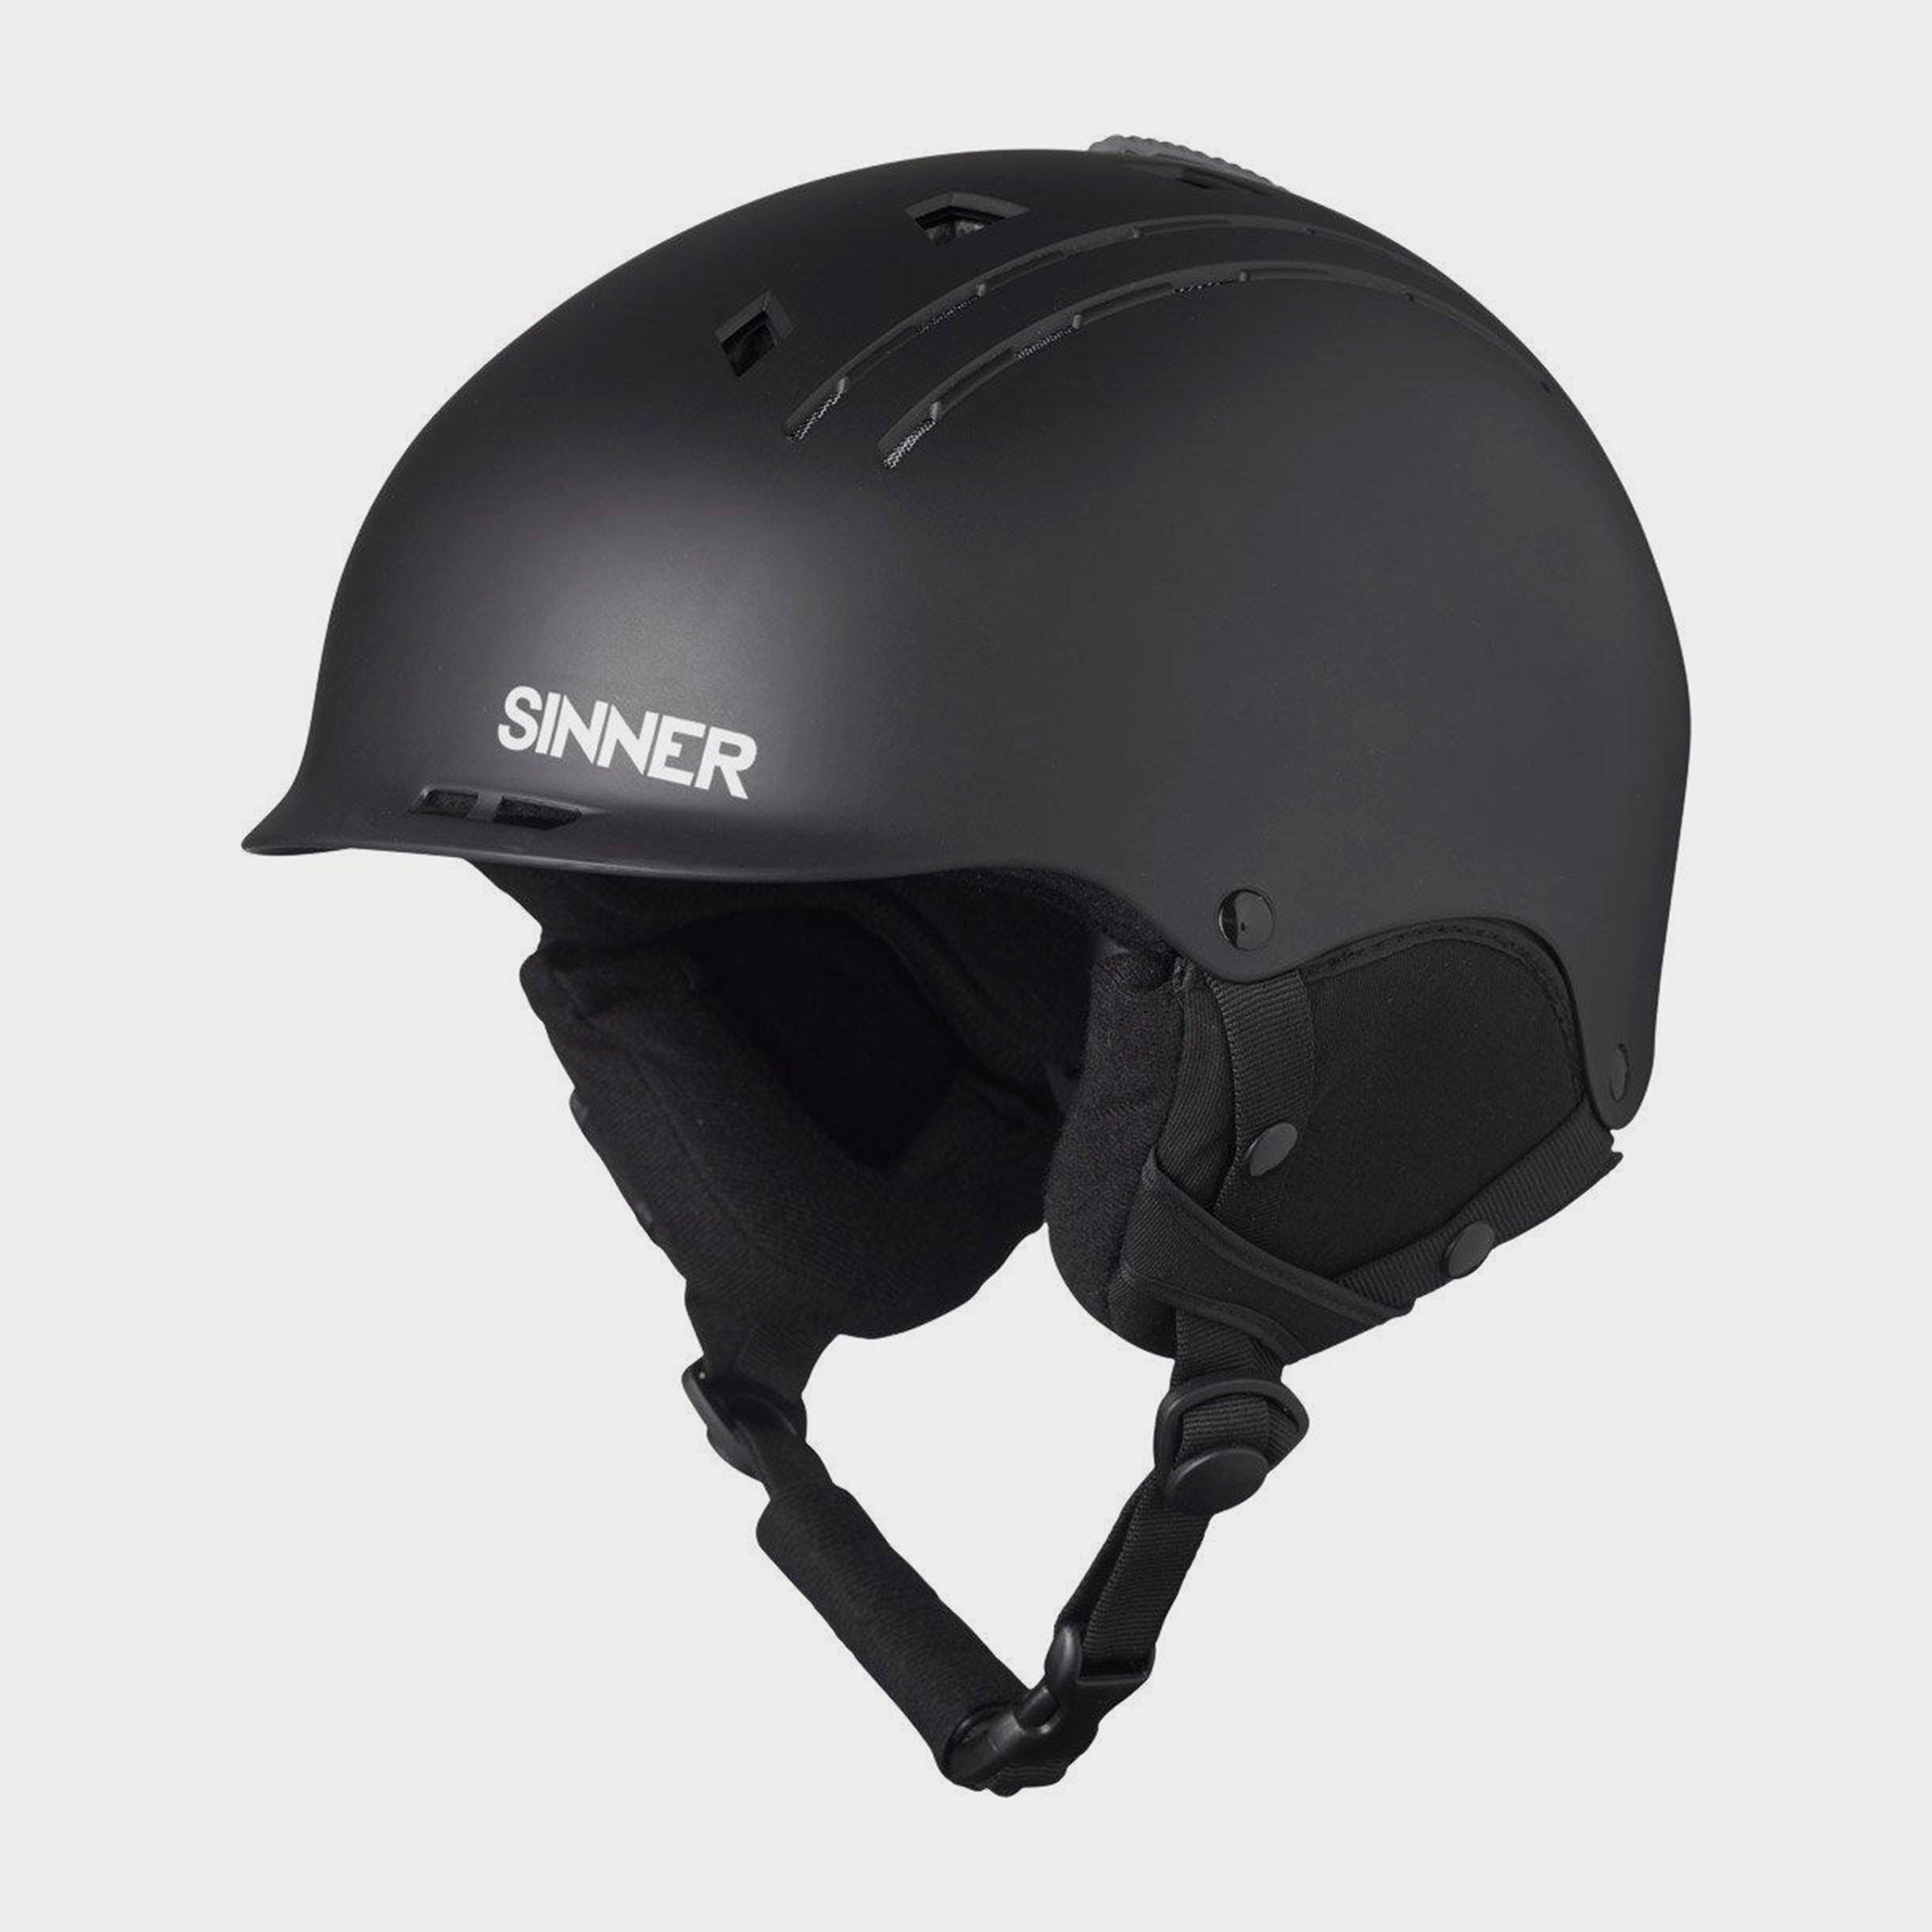 Sinner Sinner Pincher Helmet - Black, Black